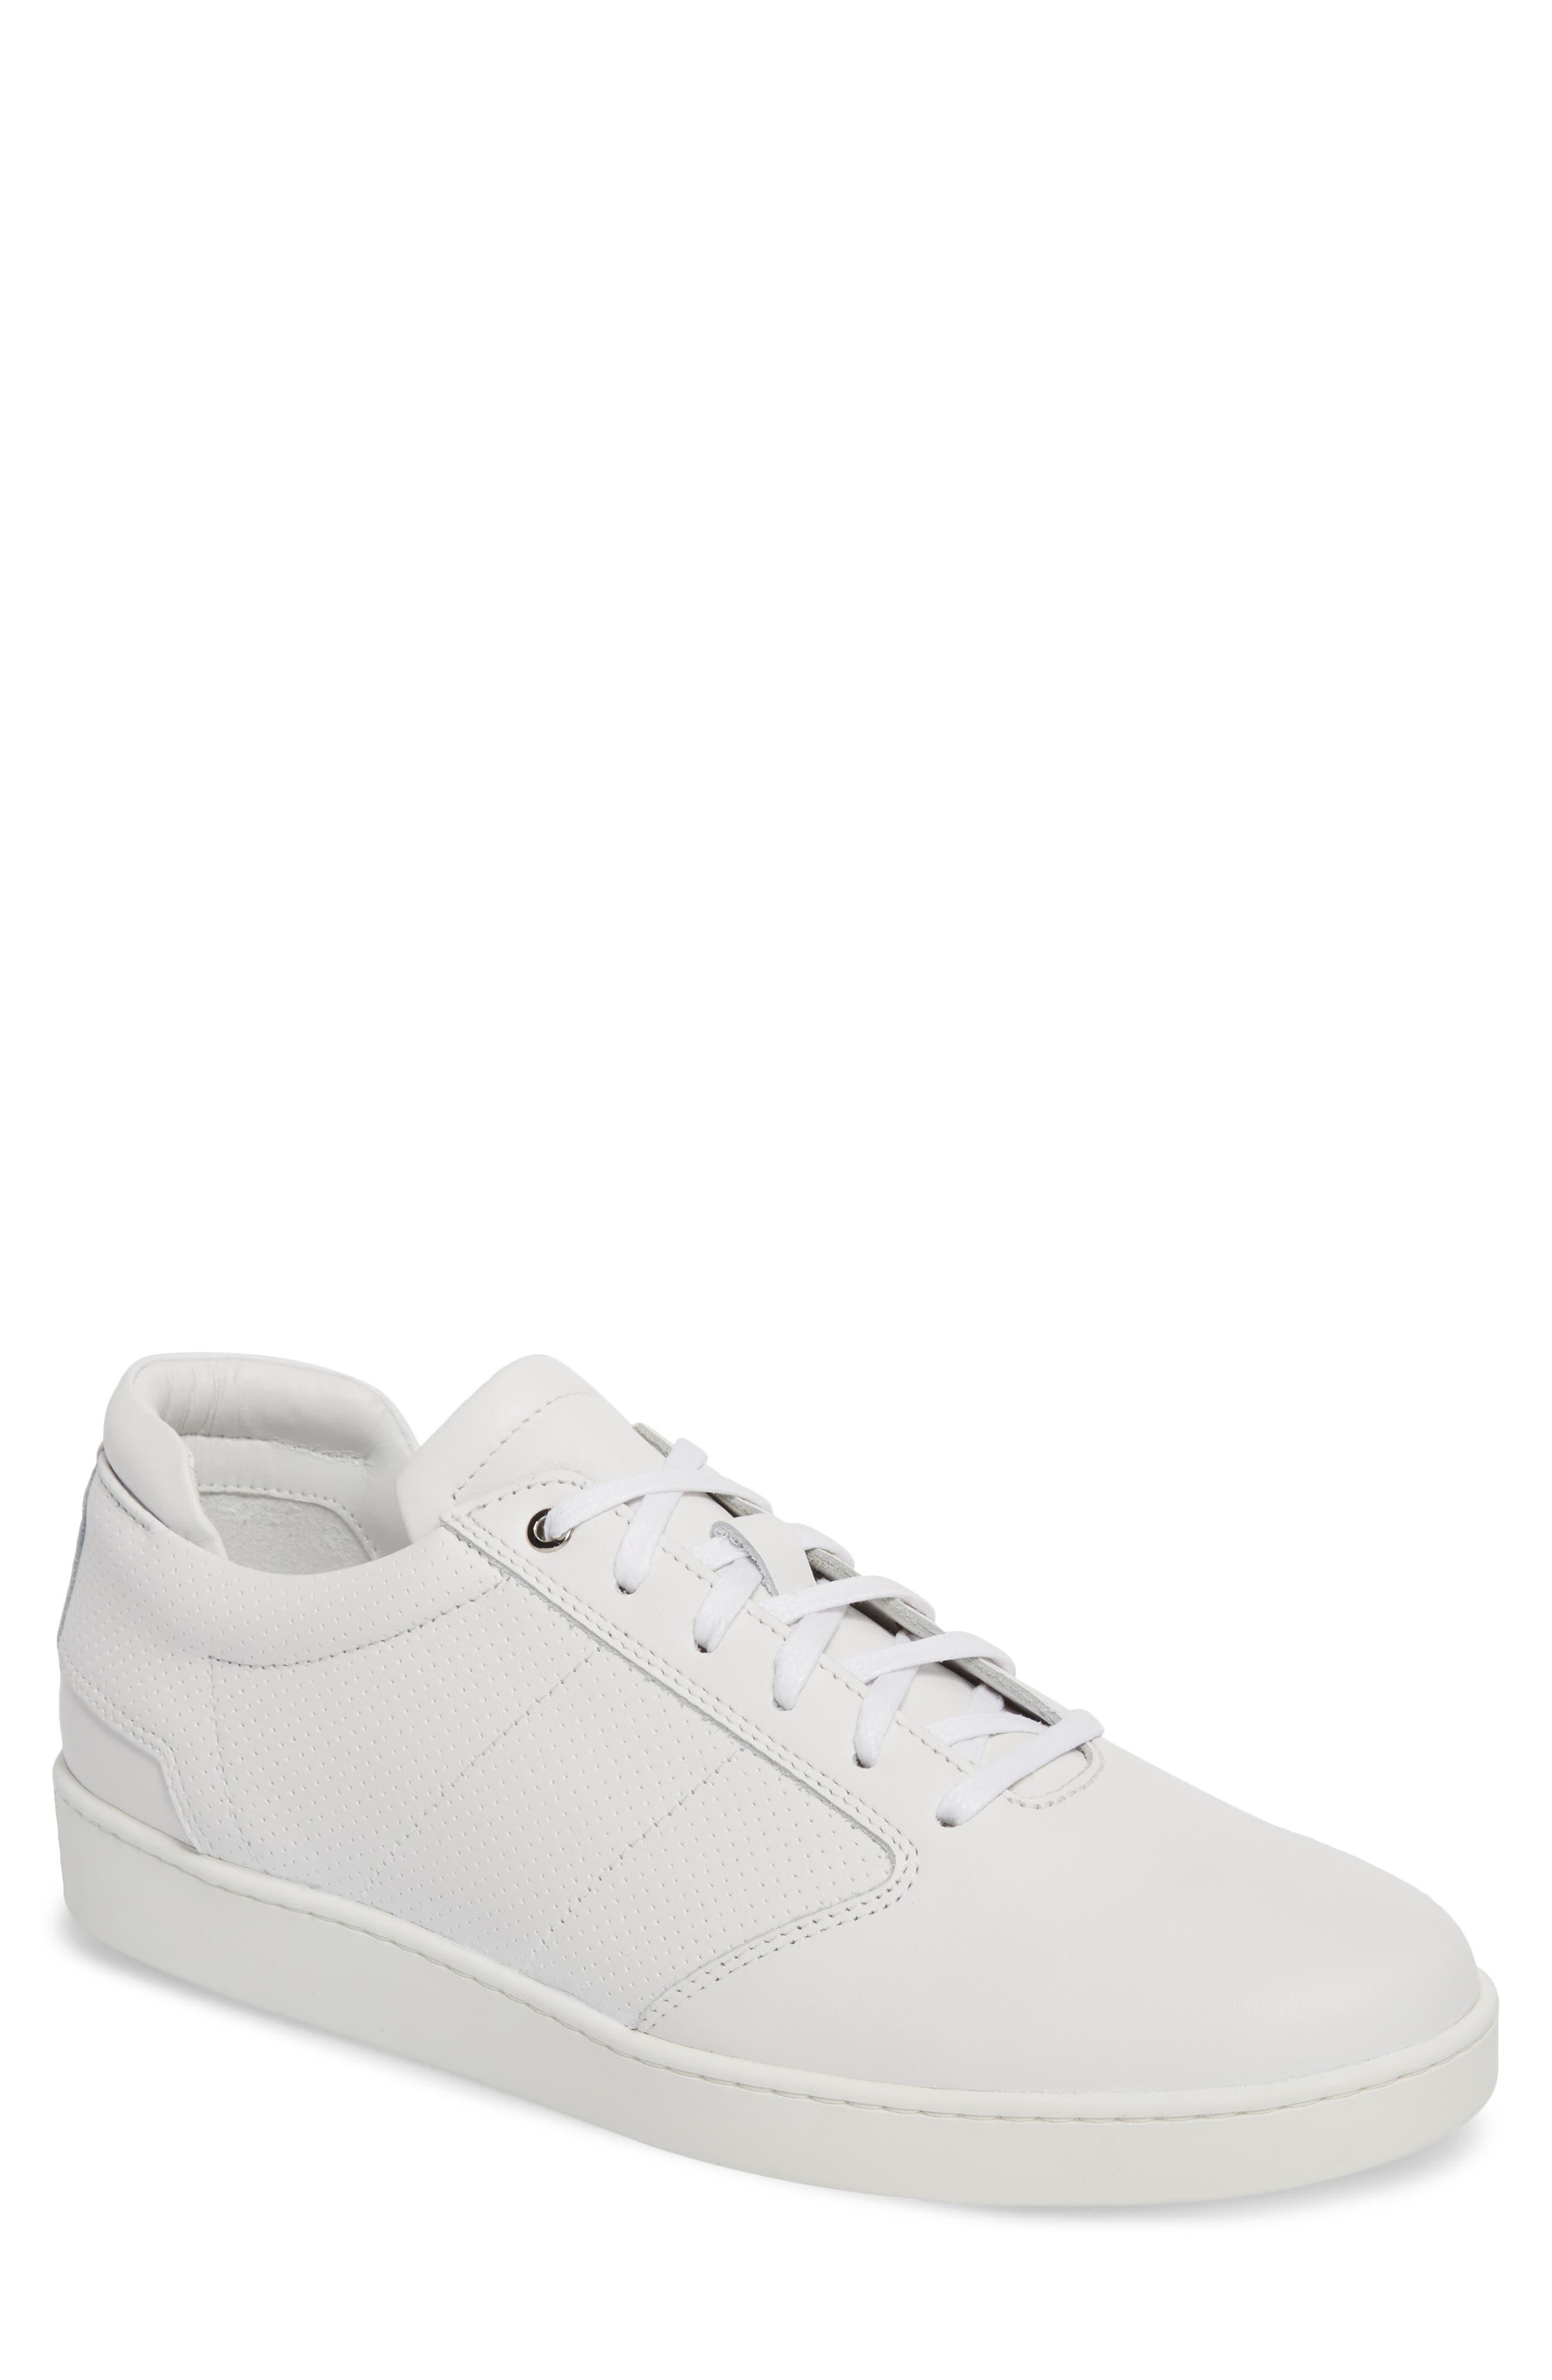 Lennon Sneaker,                             Main thumbnail 1, color,                             177